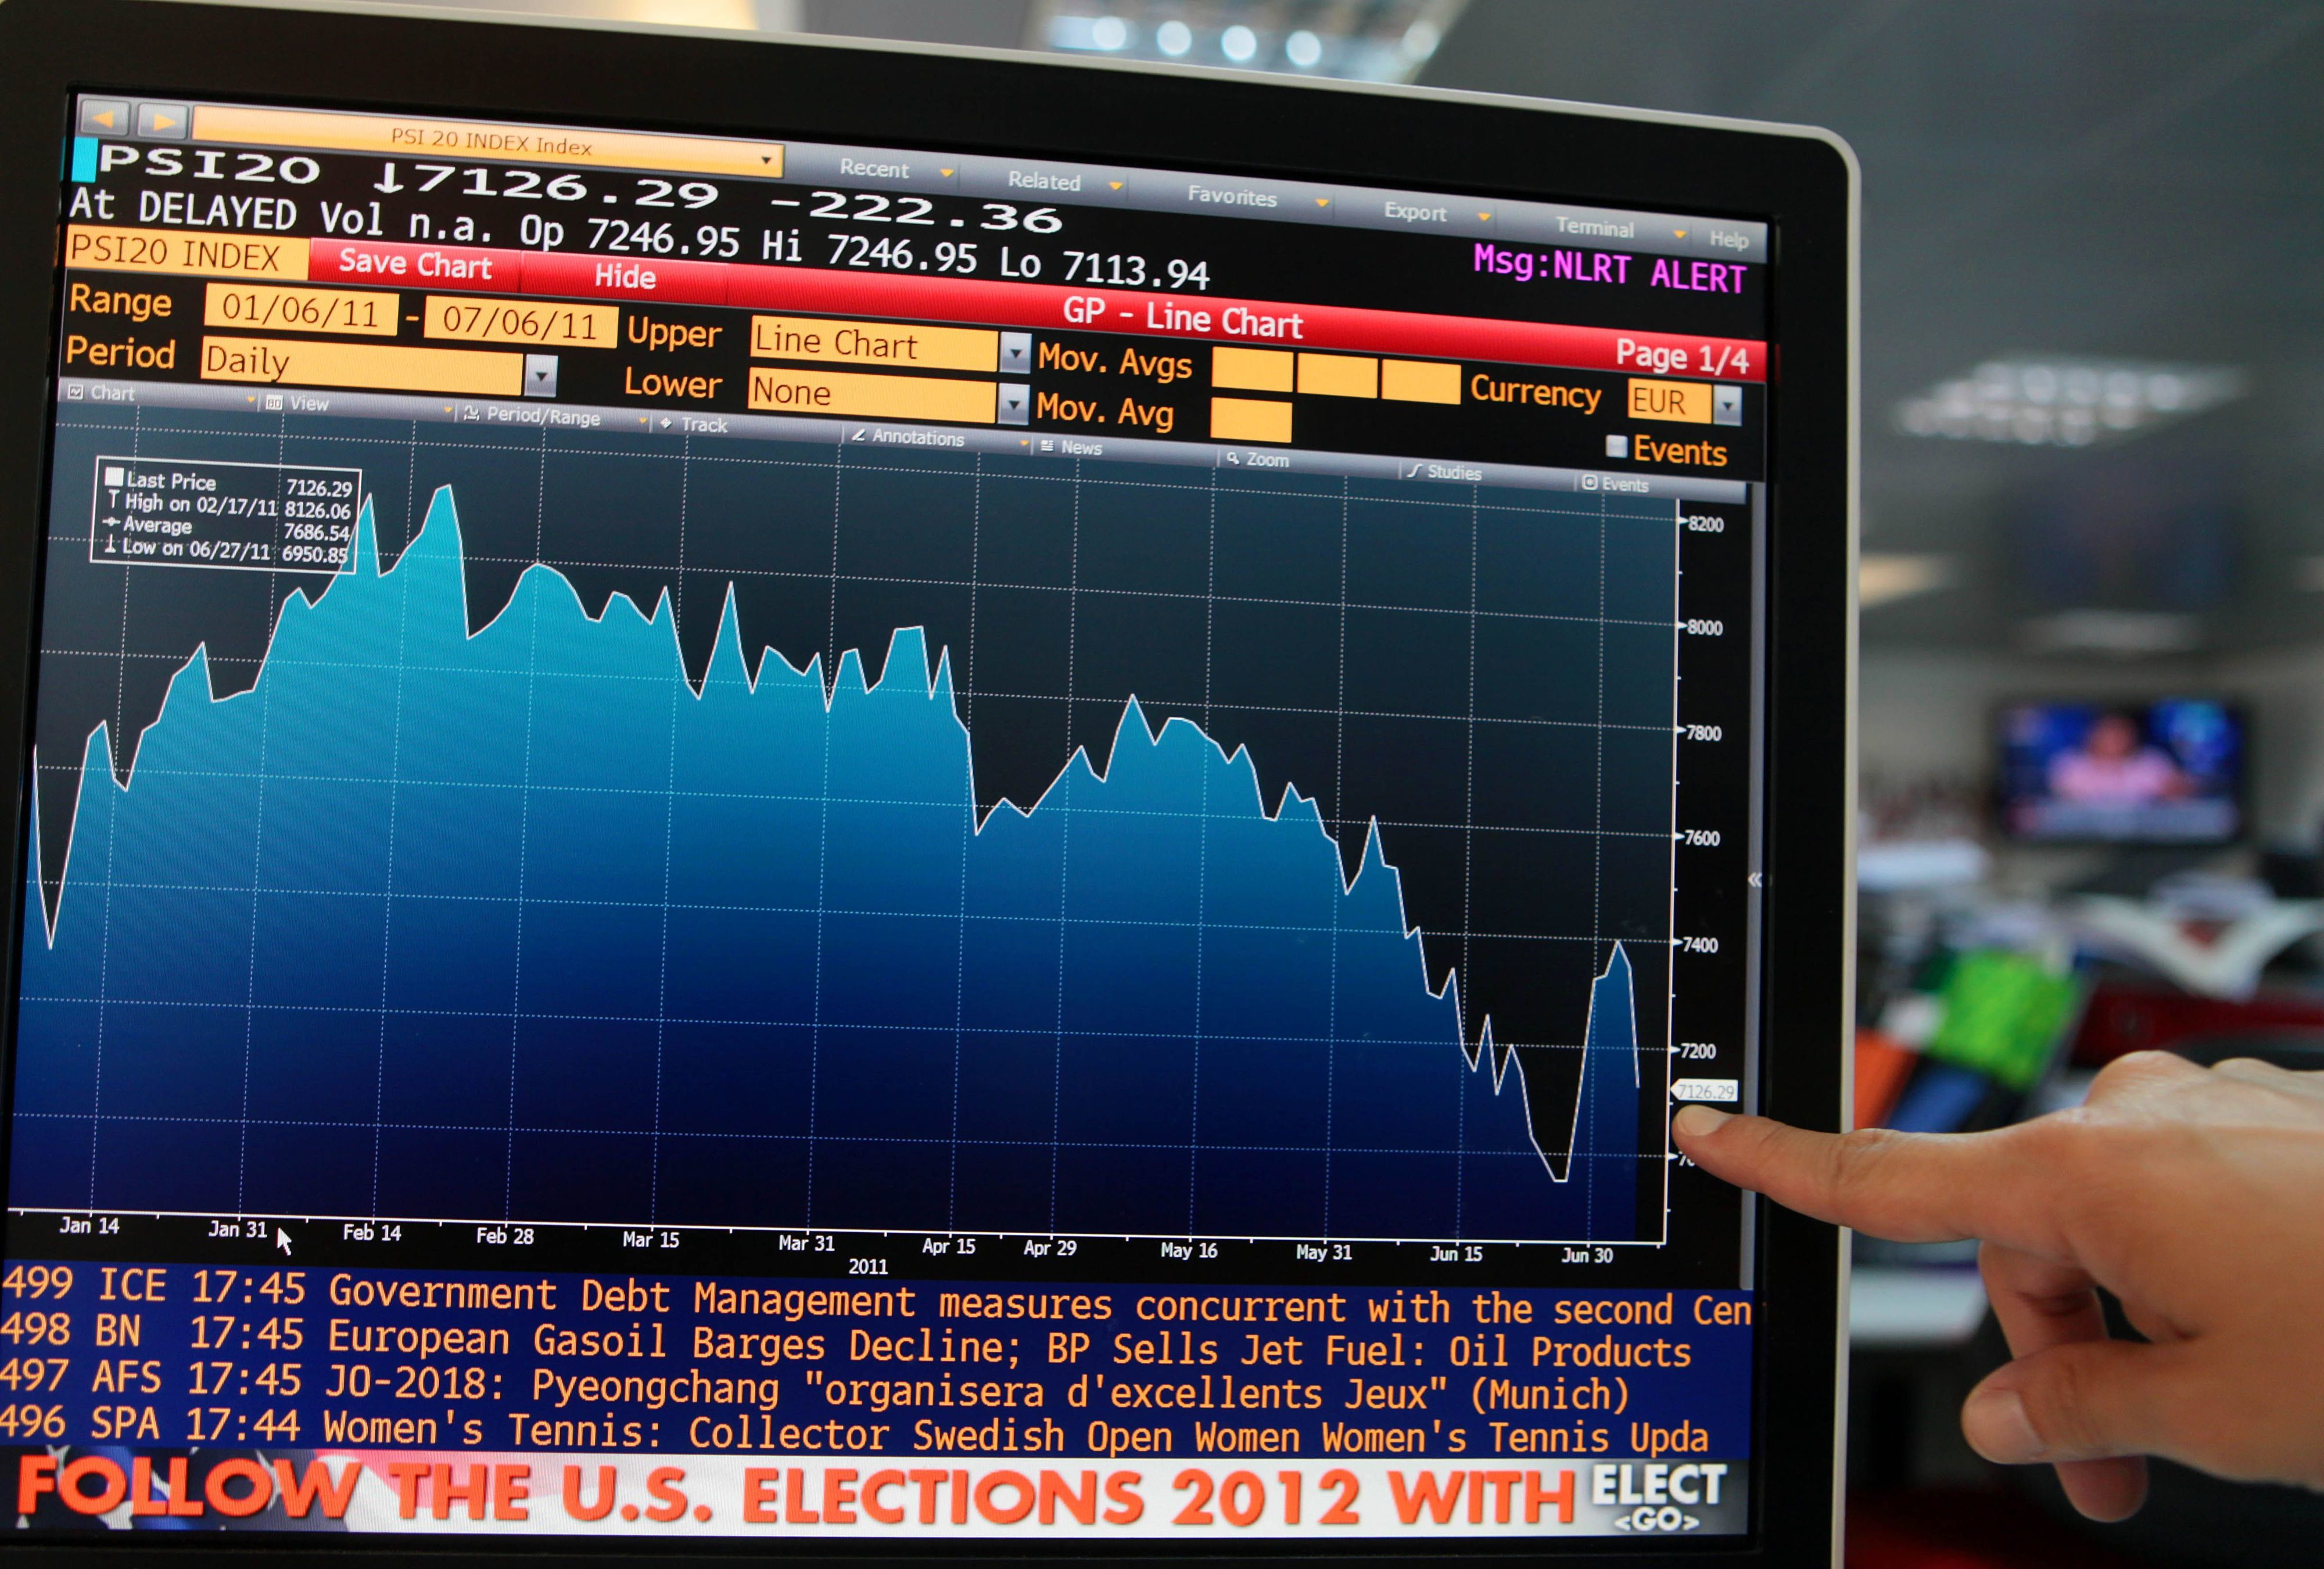 PSI20 cai 0,22% e acompanha tendência europeia